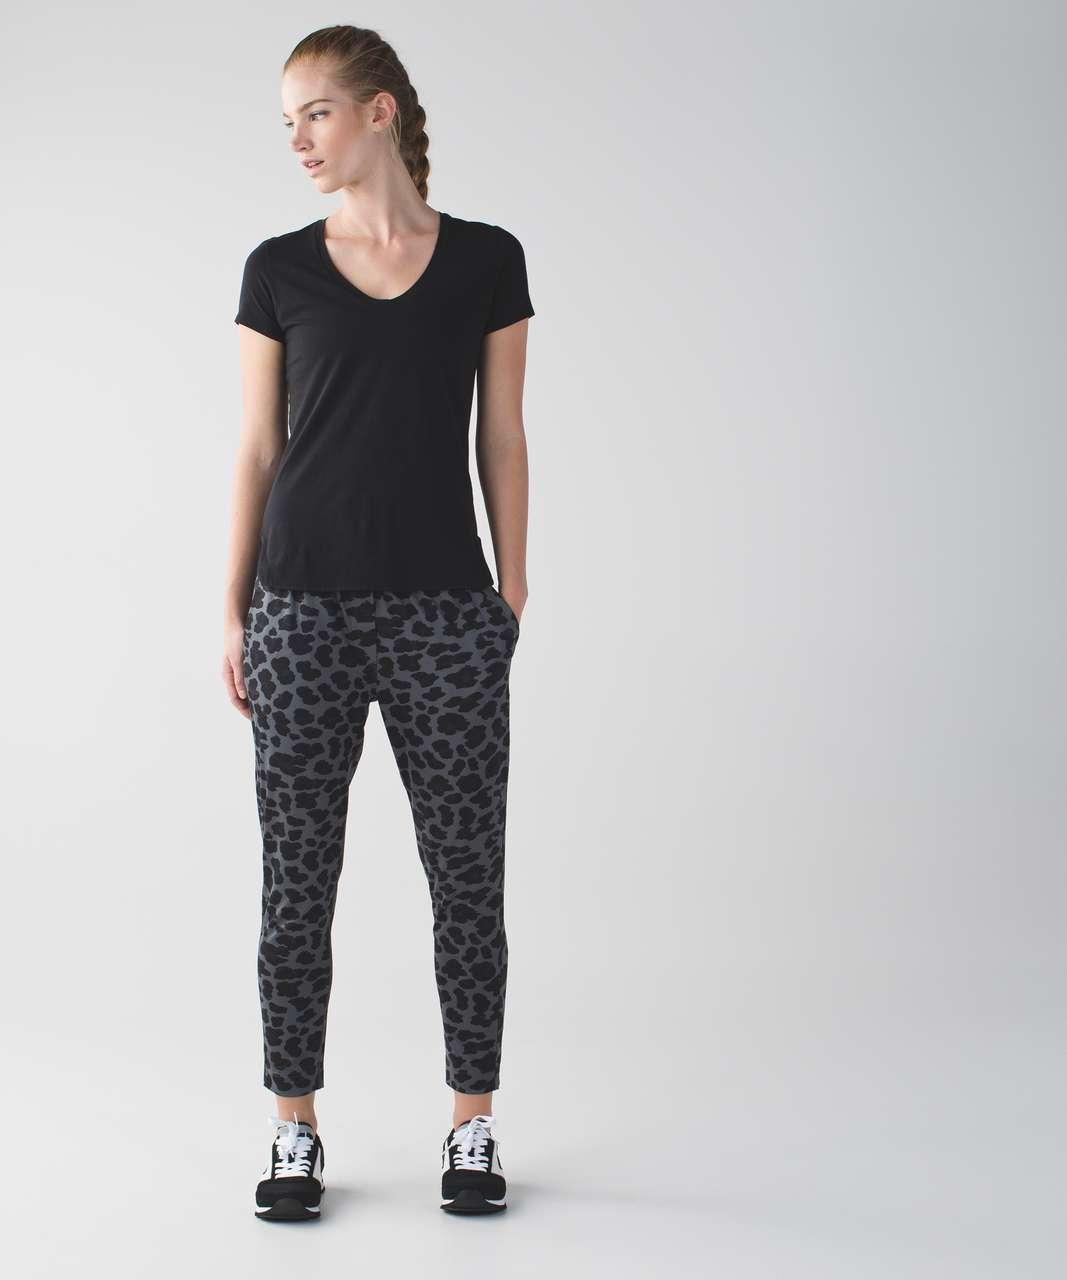 dba2e825 Black Shirt With Cheetah Print Pocket – EDGE Engineering and ...